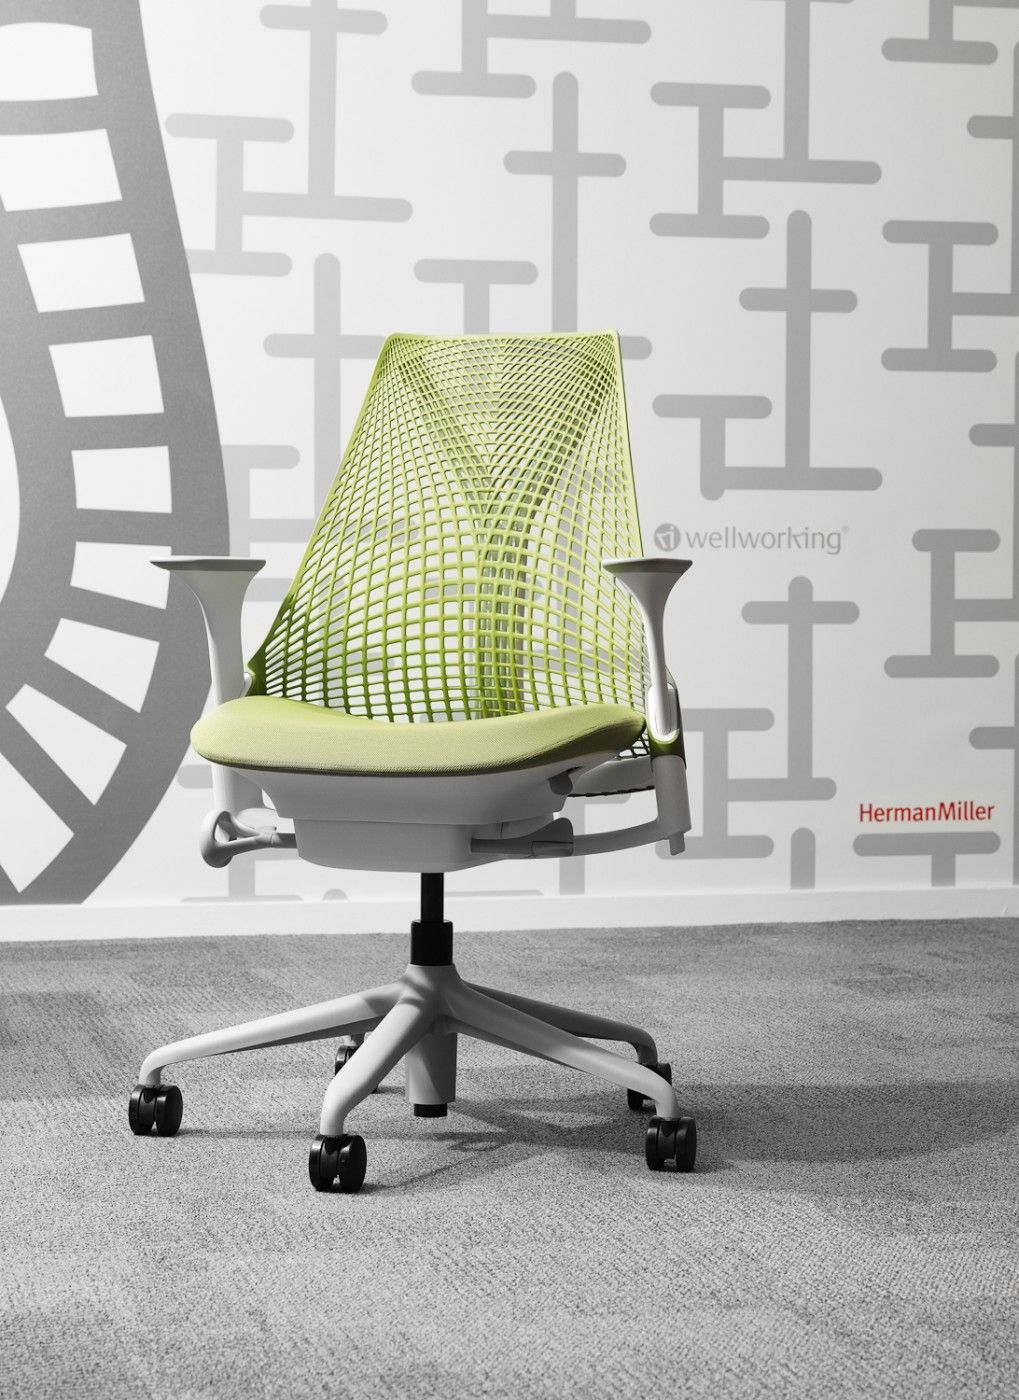 chair design research kohls anti gravity 39 99 herman miller sayl es needs a comfortable good value